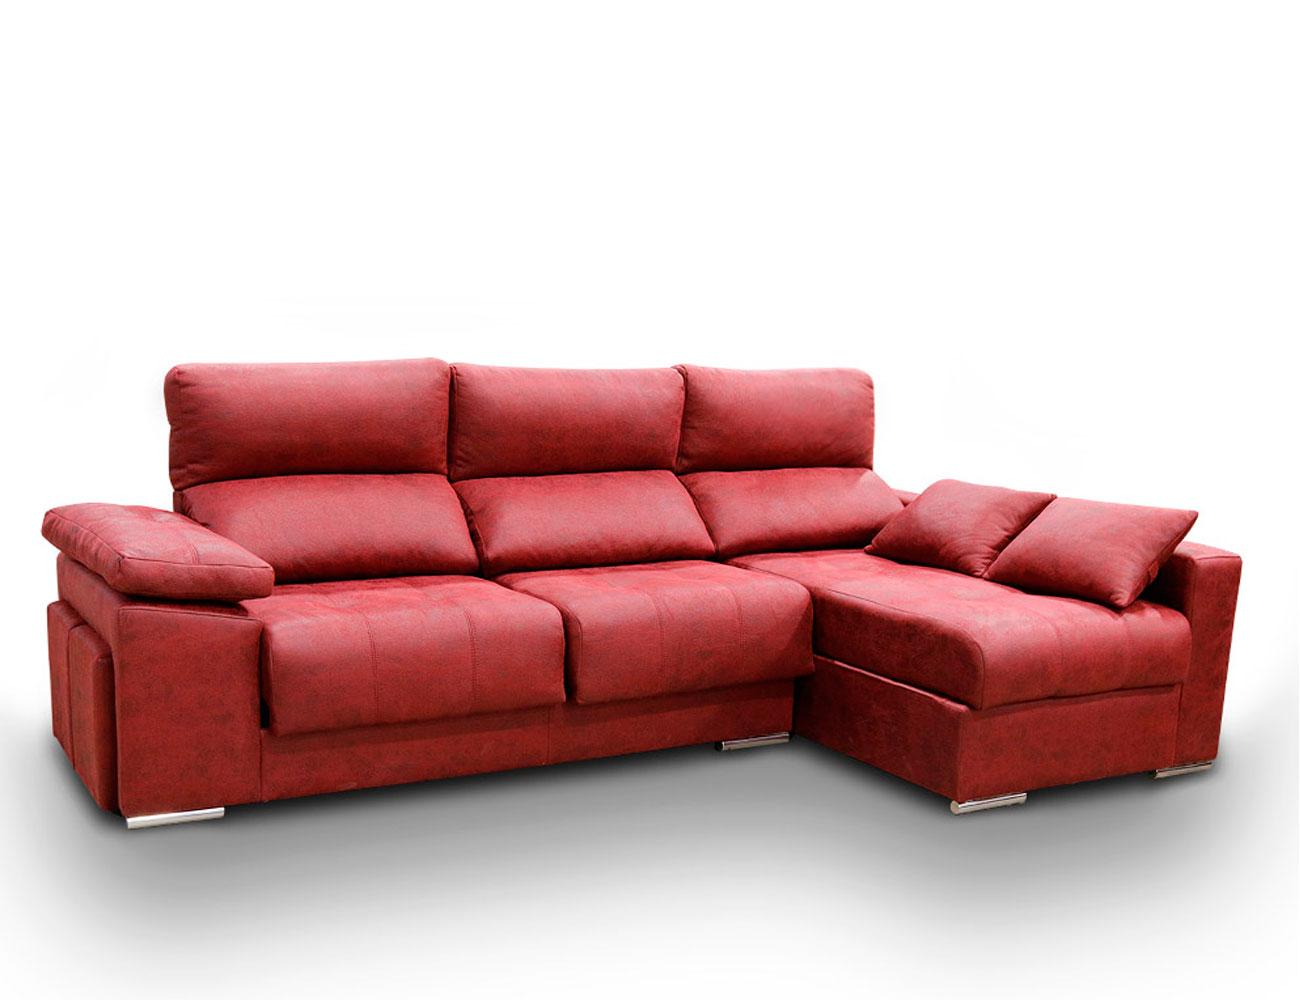 Sofa chaiselongue anti manchas rojo granate10